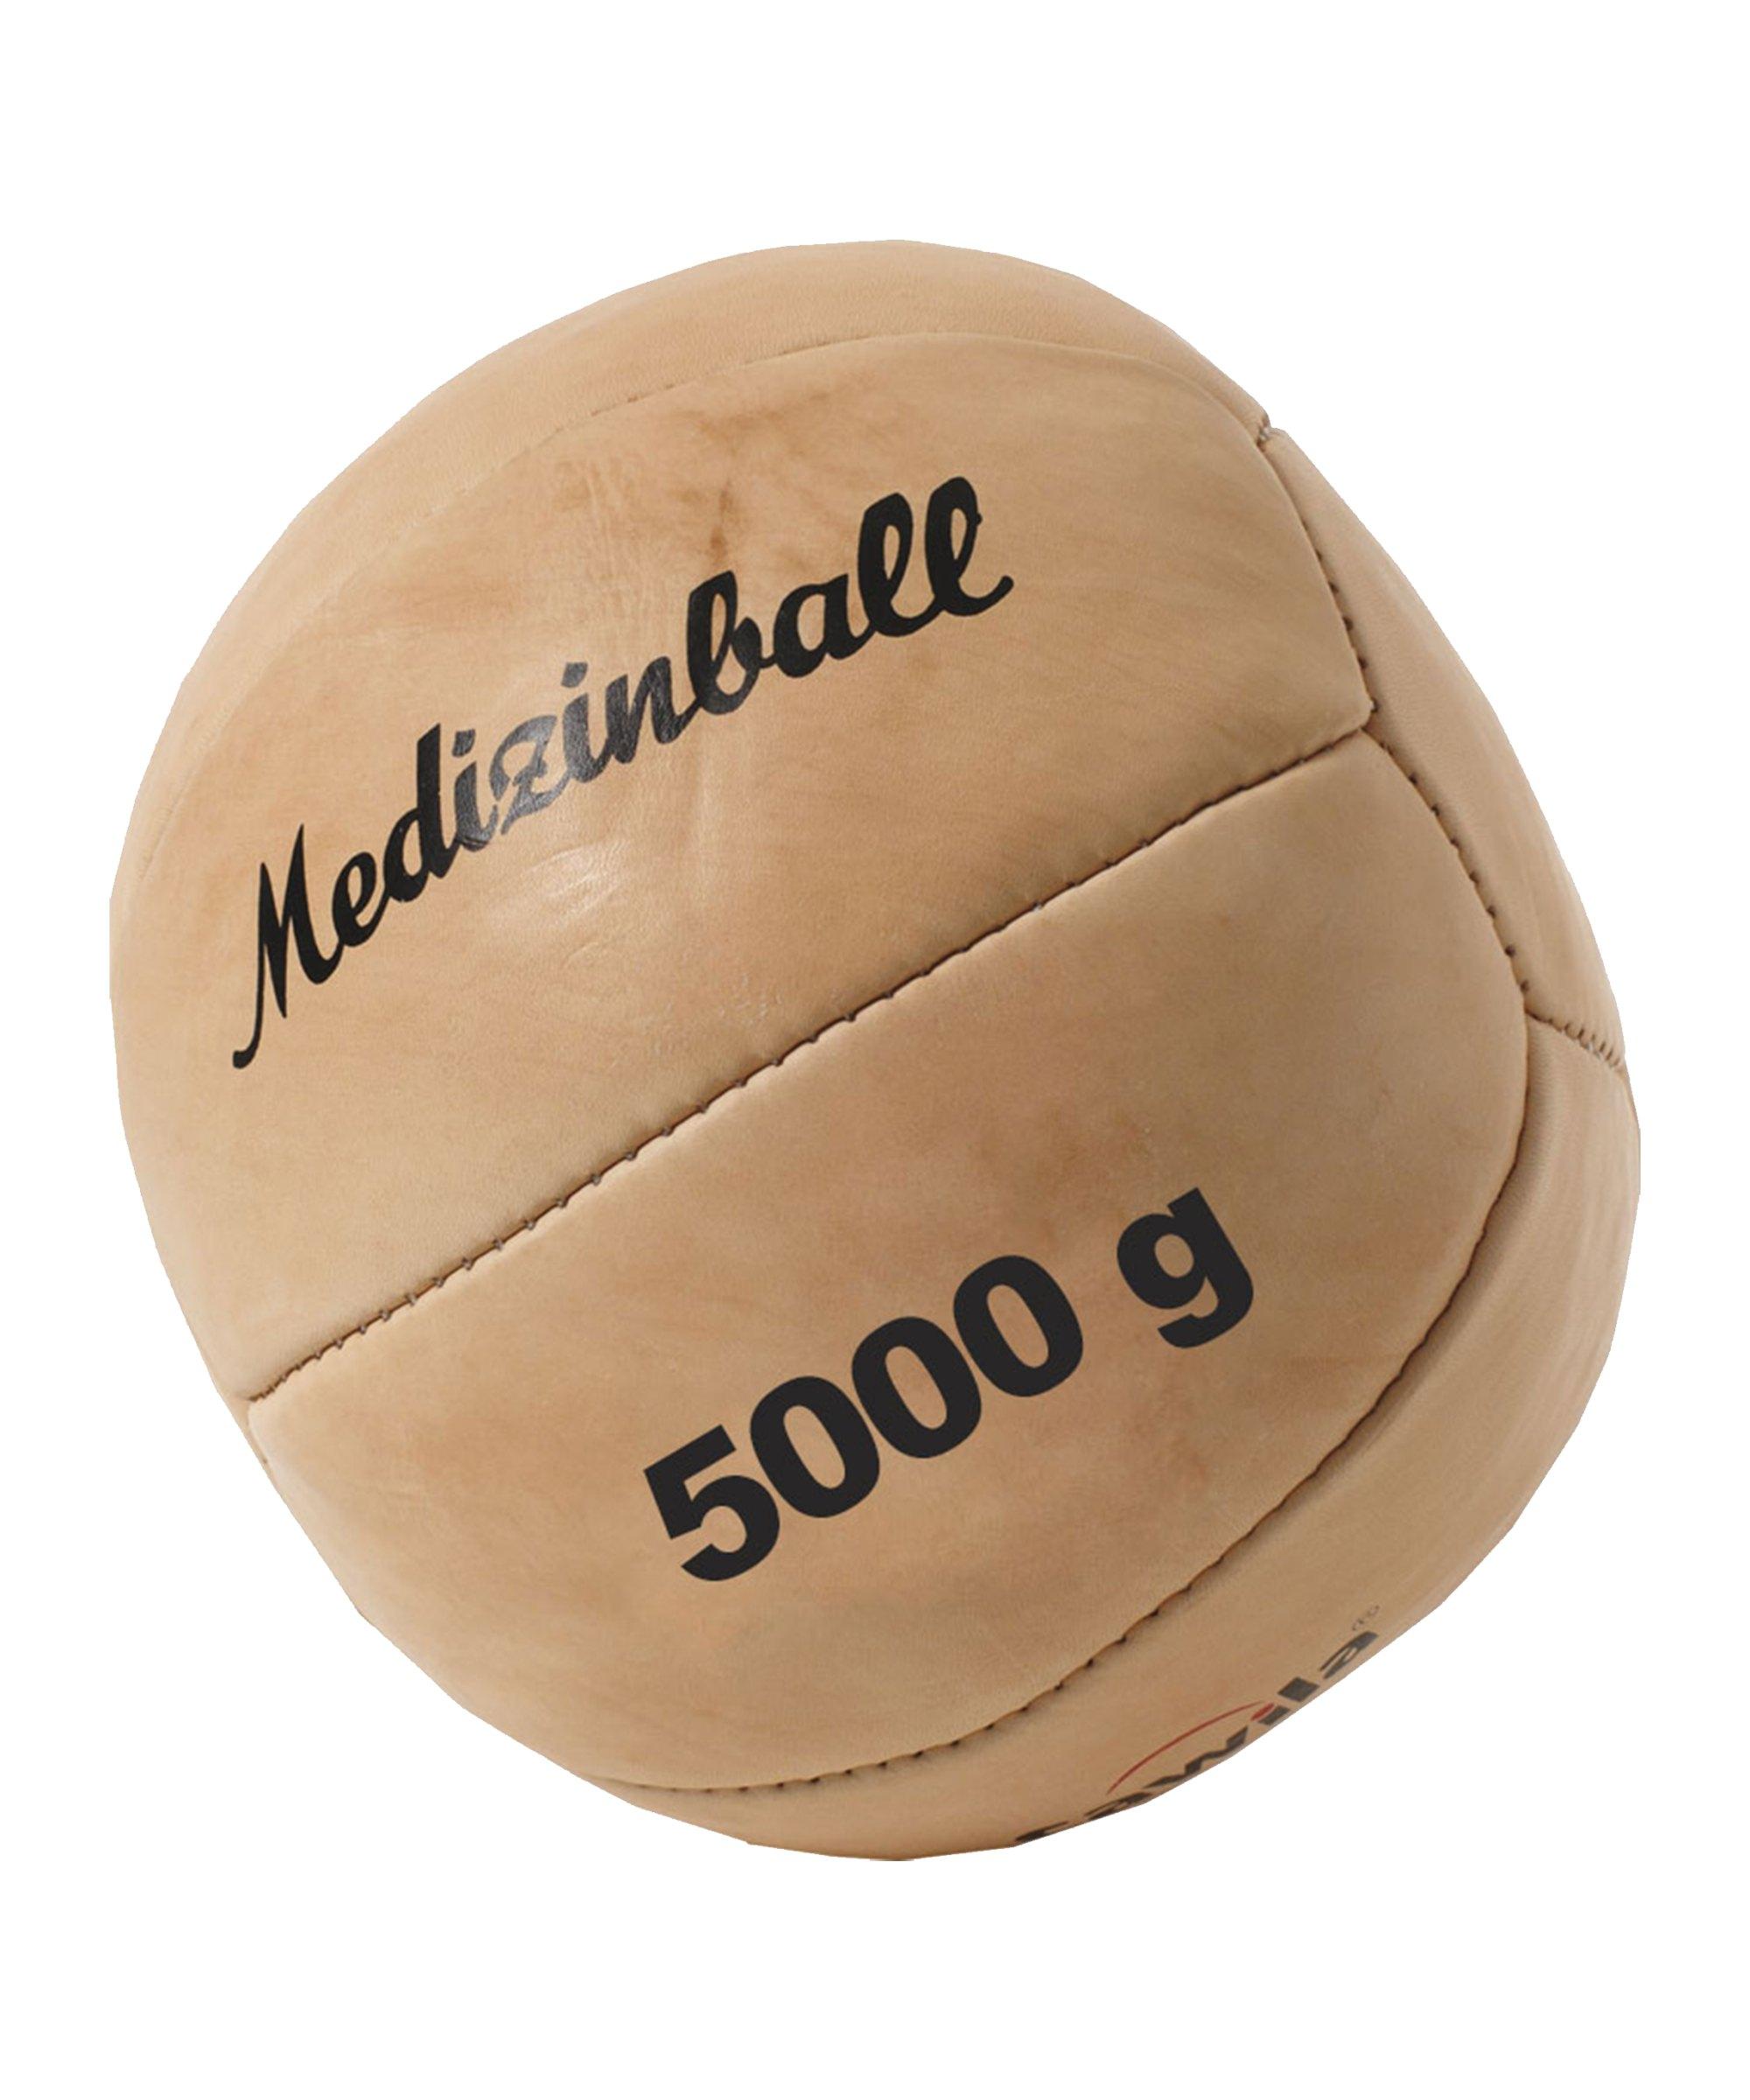 Cawila Leder Medizinball PRO 5,0 Kg Braun - braun